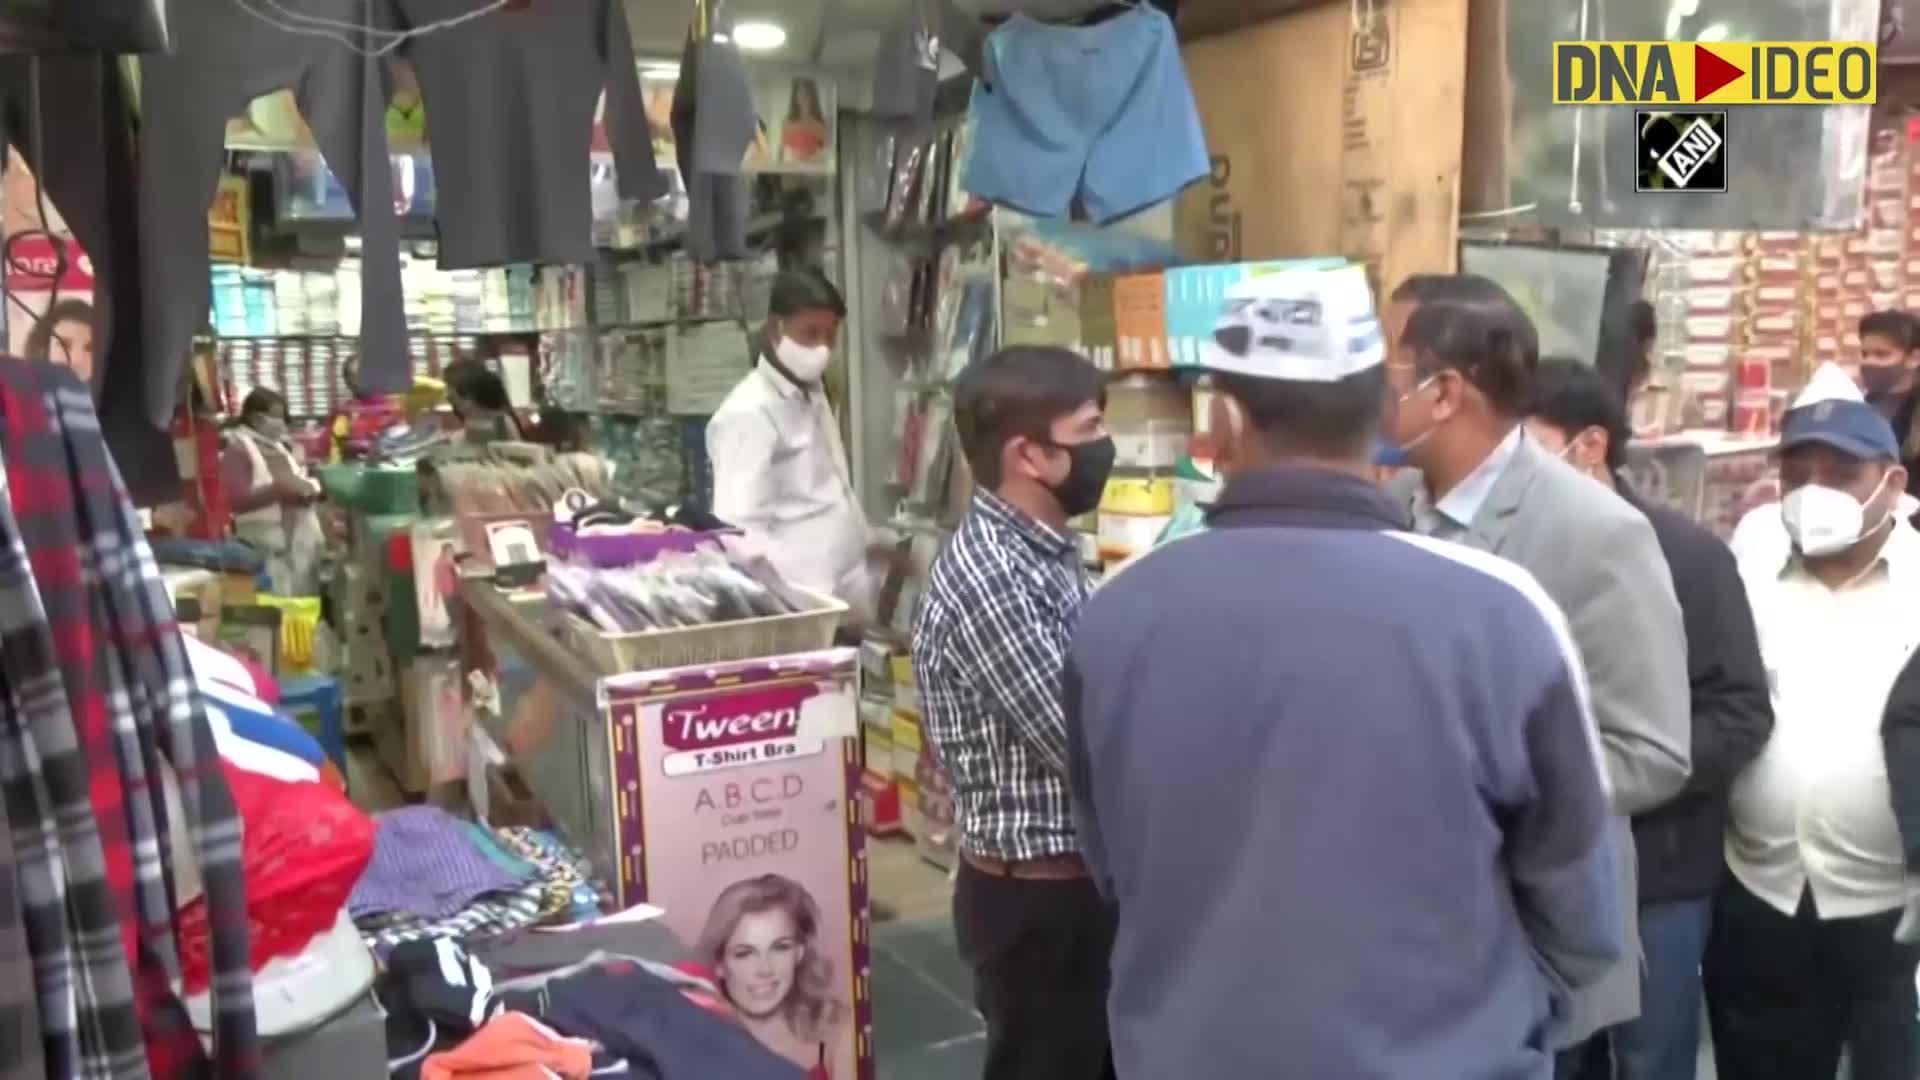 COVID-19: Satyendar Jain distributes face masks in Delhi's Shakur Basti